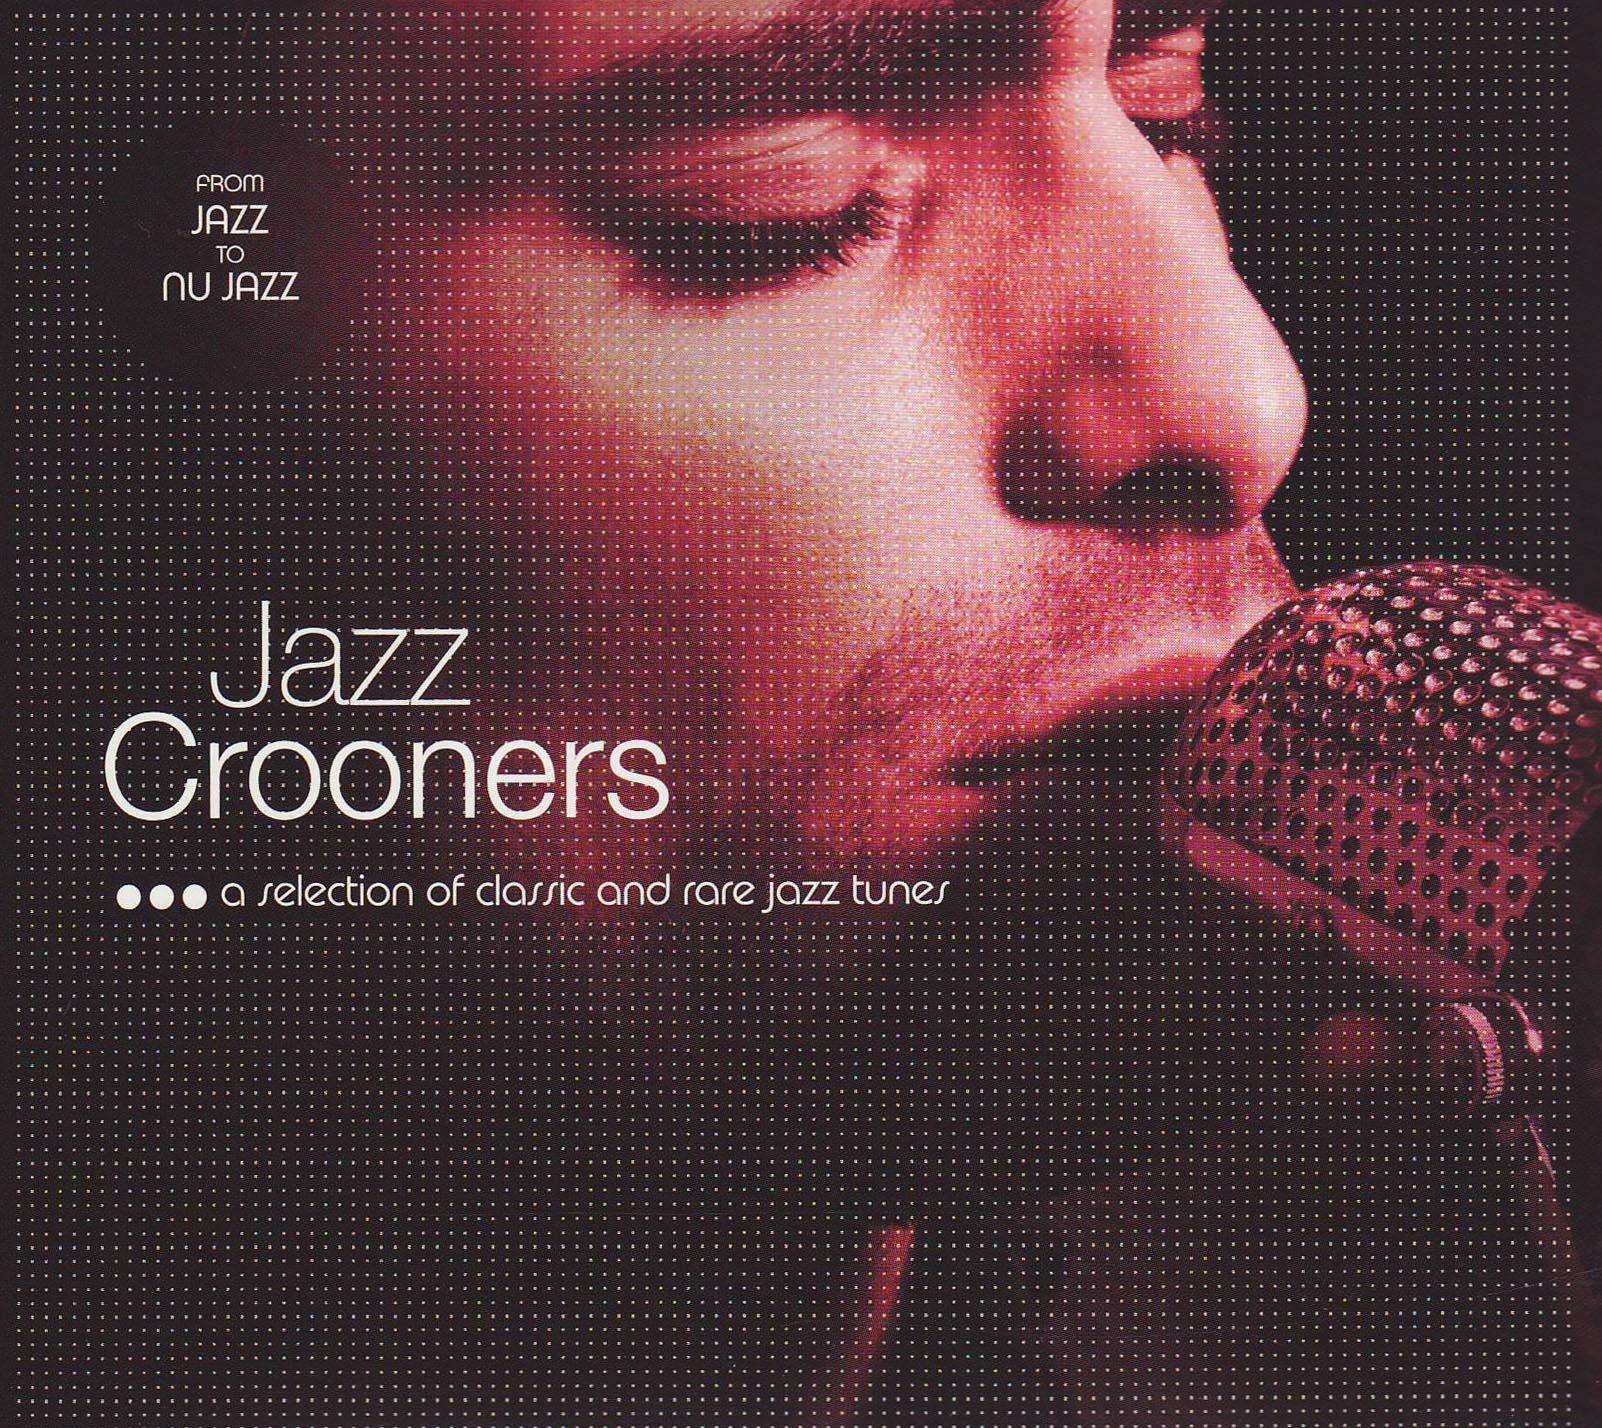 Jazz Crooners-from Jazz to Nu Jazz